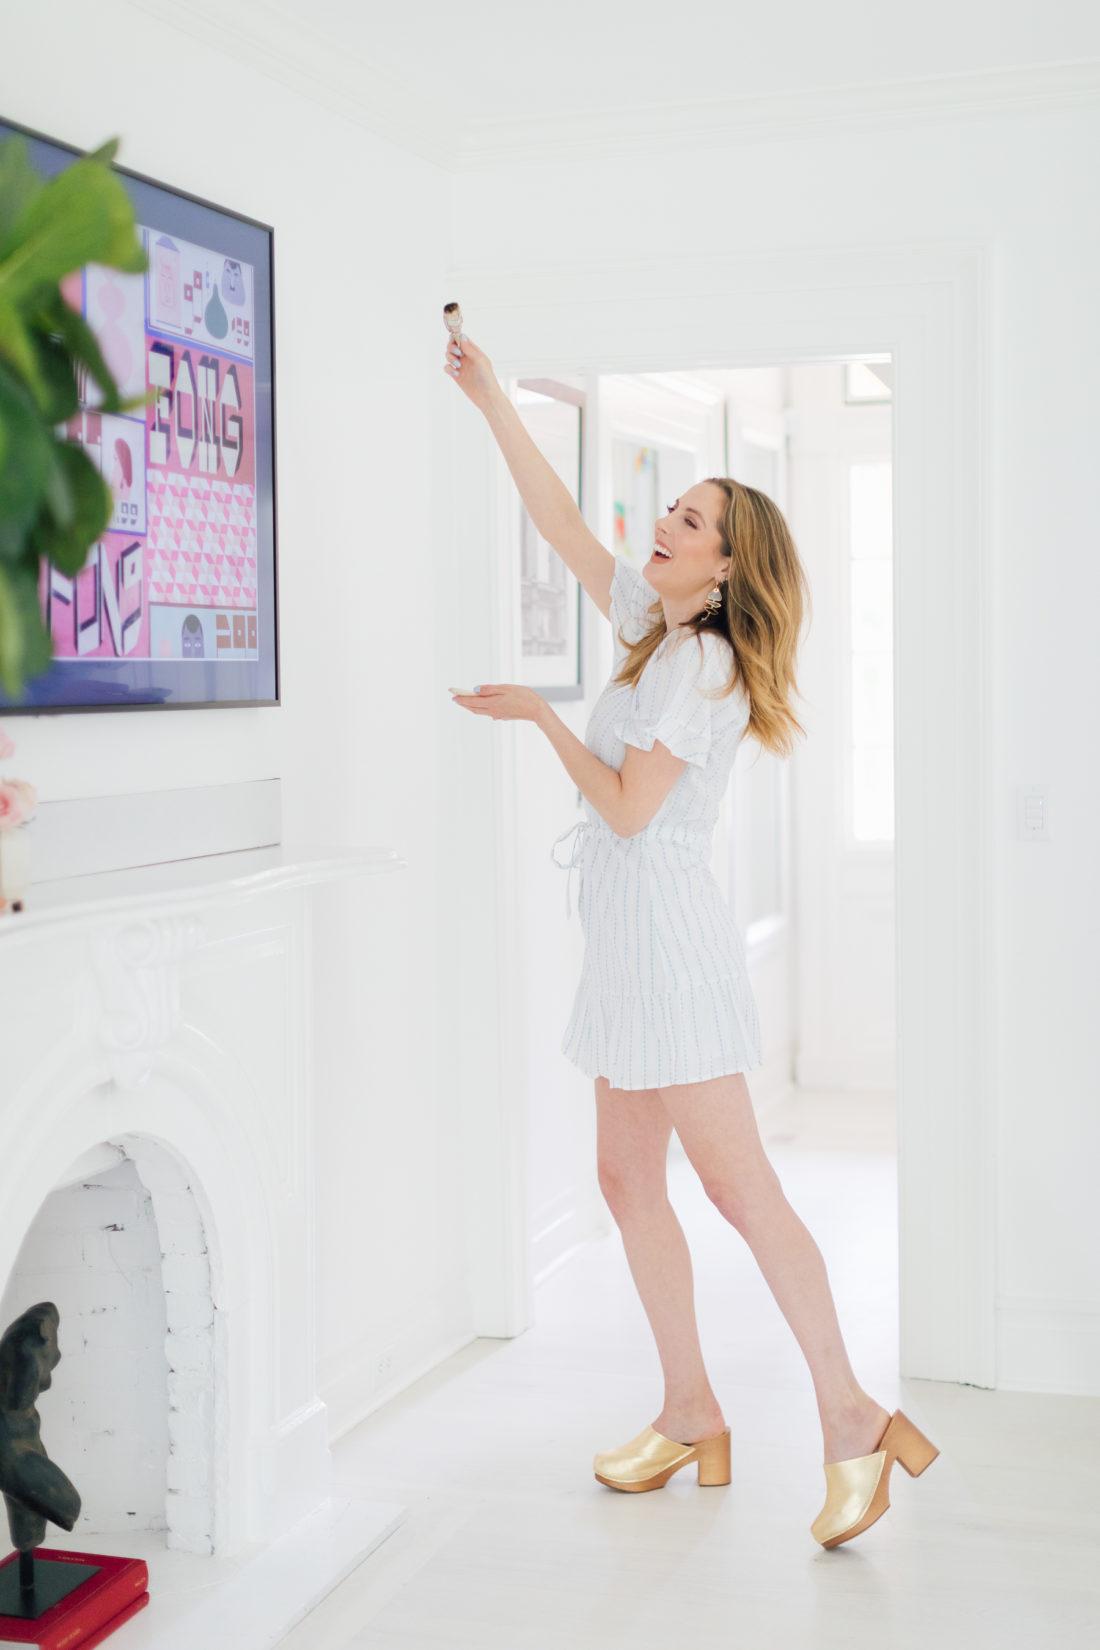 Eva Amurri Martino lighting sage to cleanse the energy in her Westport CT home